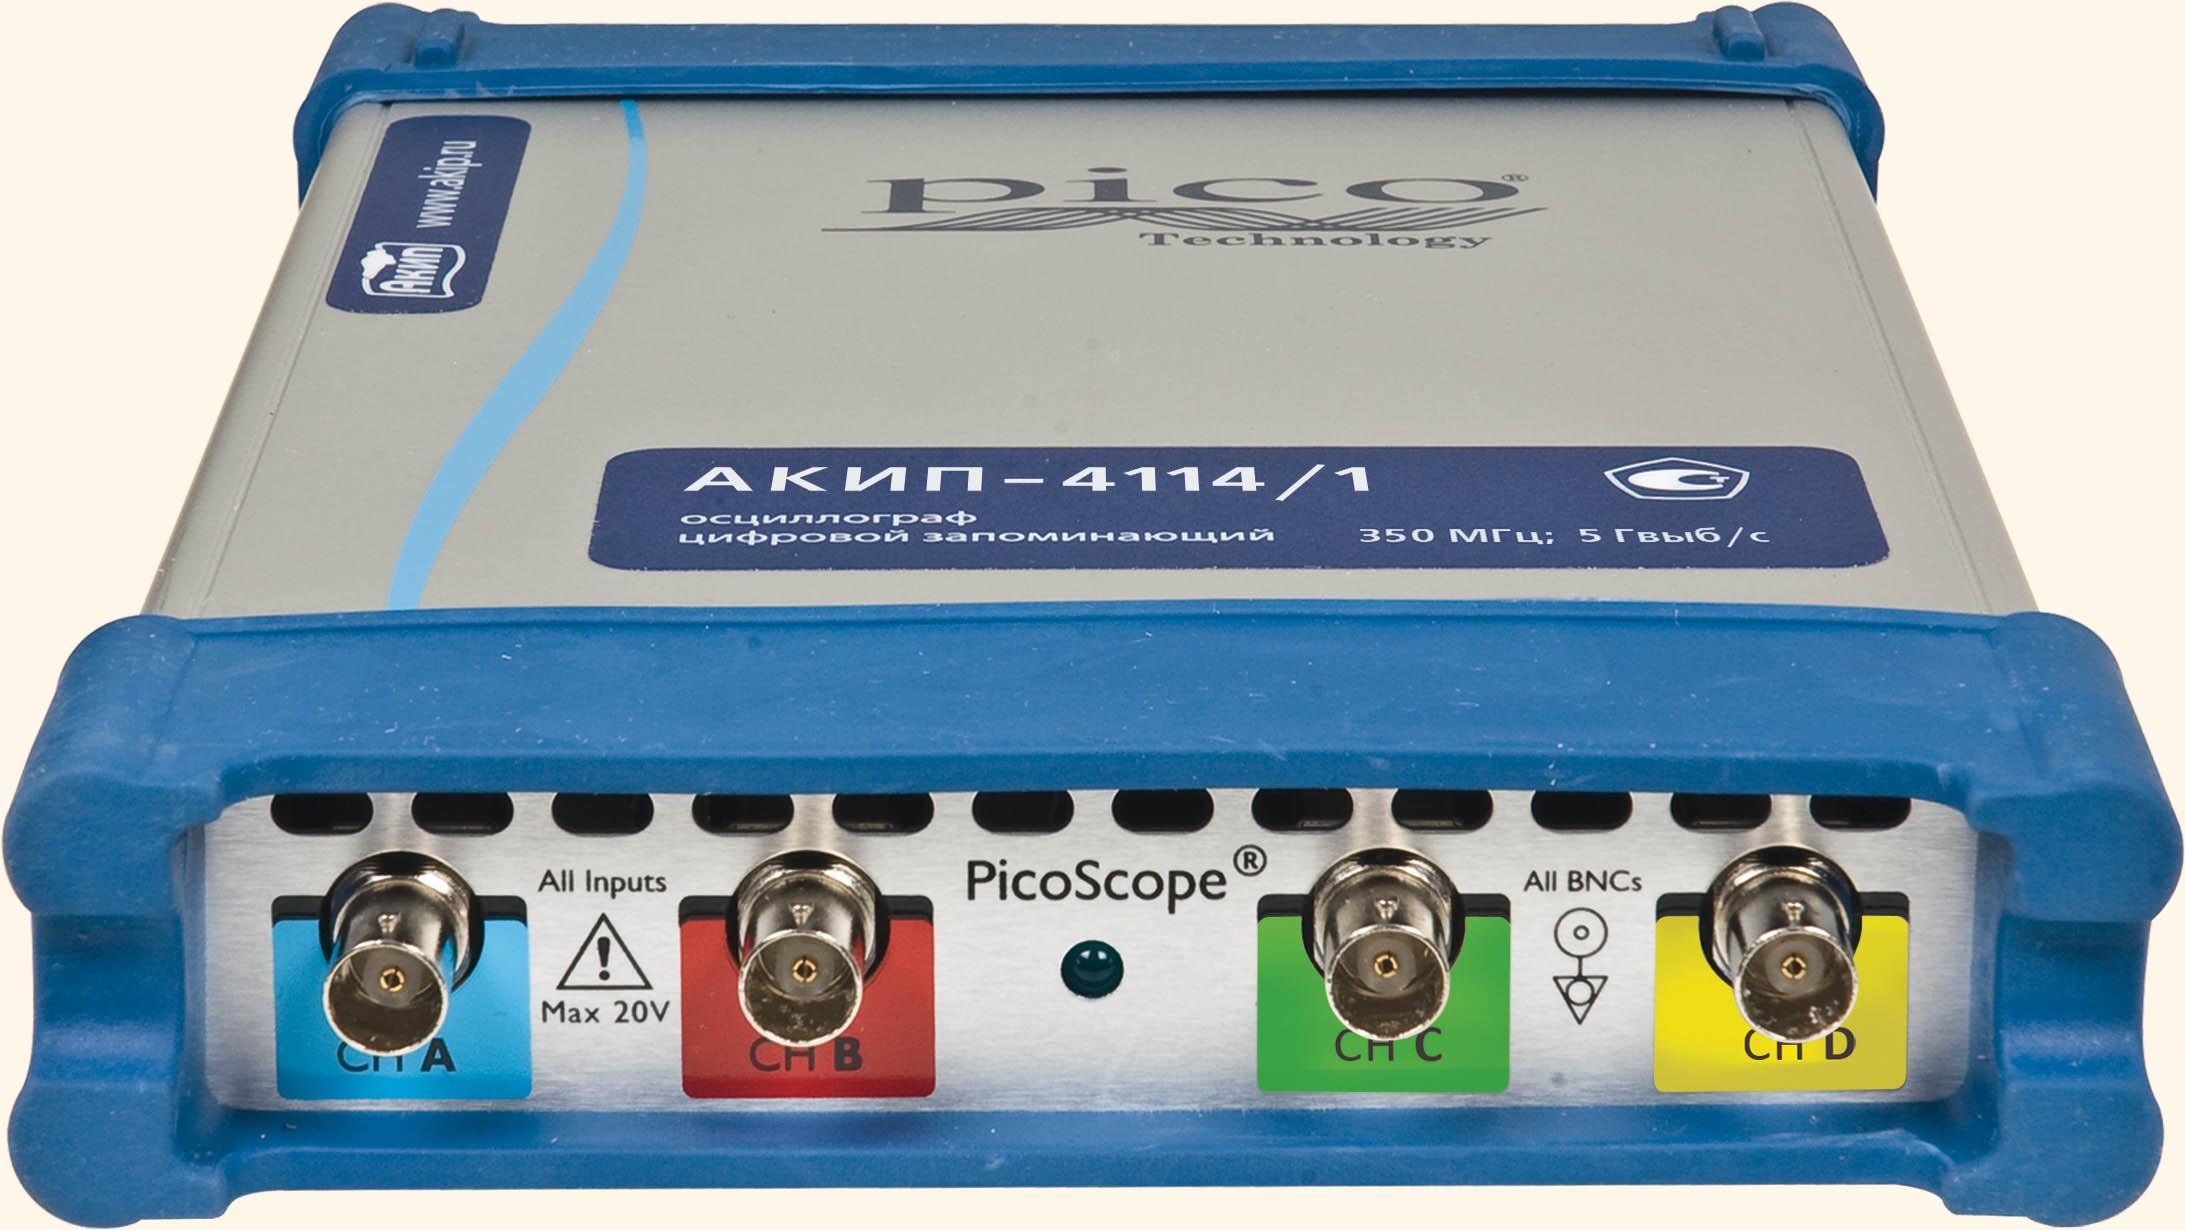 USB-осциллографы АКИП-4114